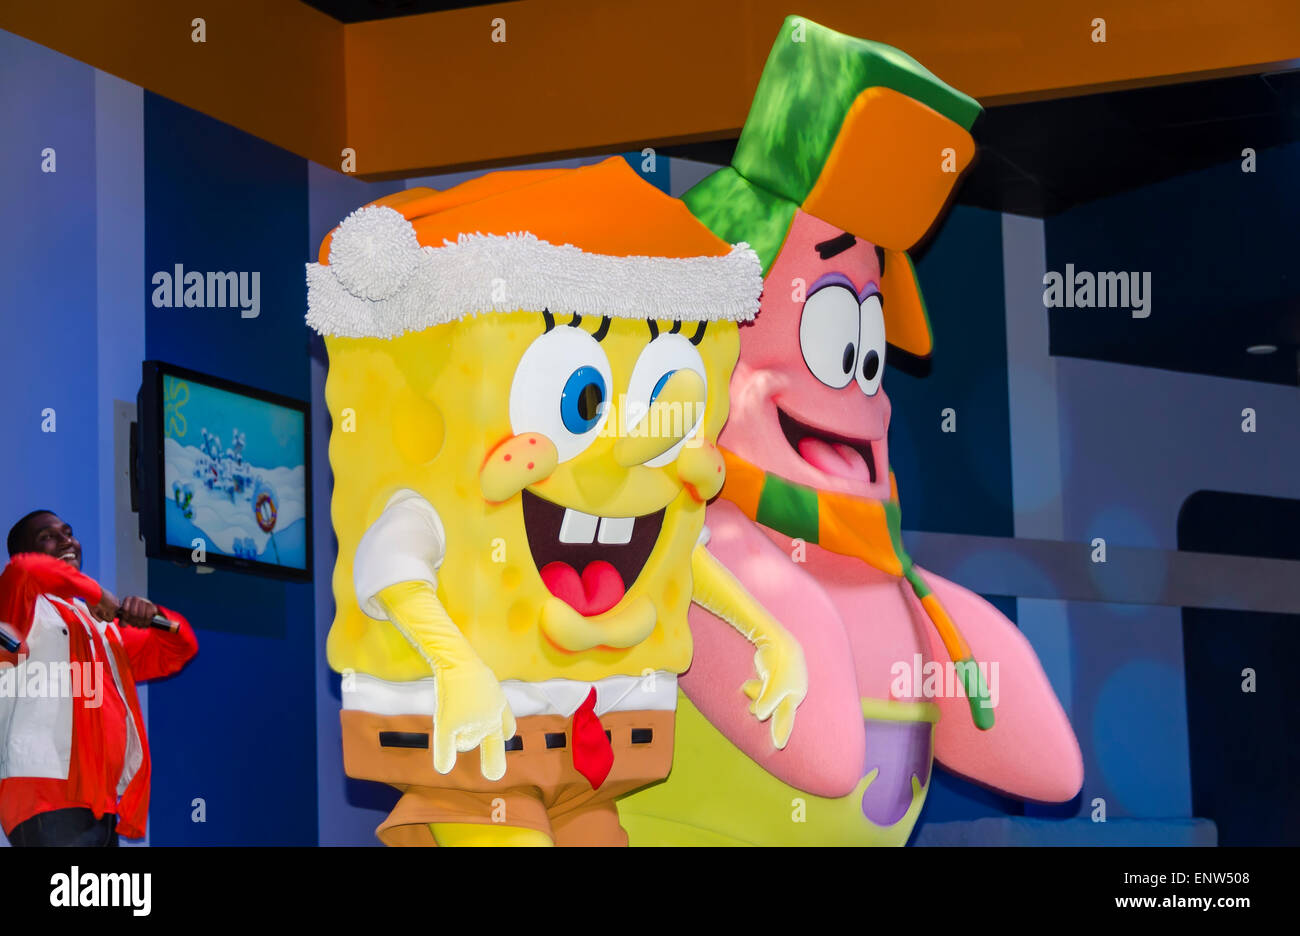 Spongebob Cartoon Stock Photos & Spongebob Cartoon Stock Images - Alamy